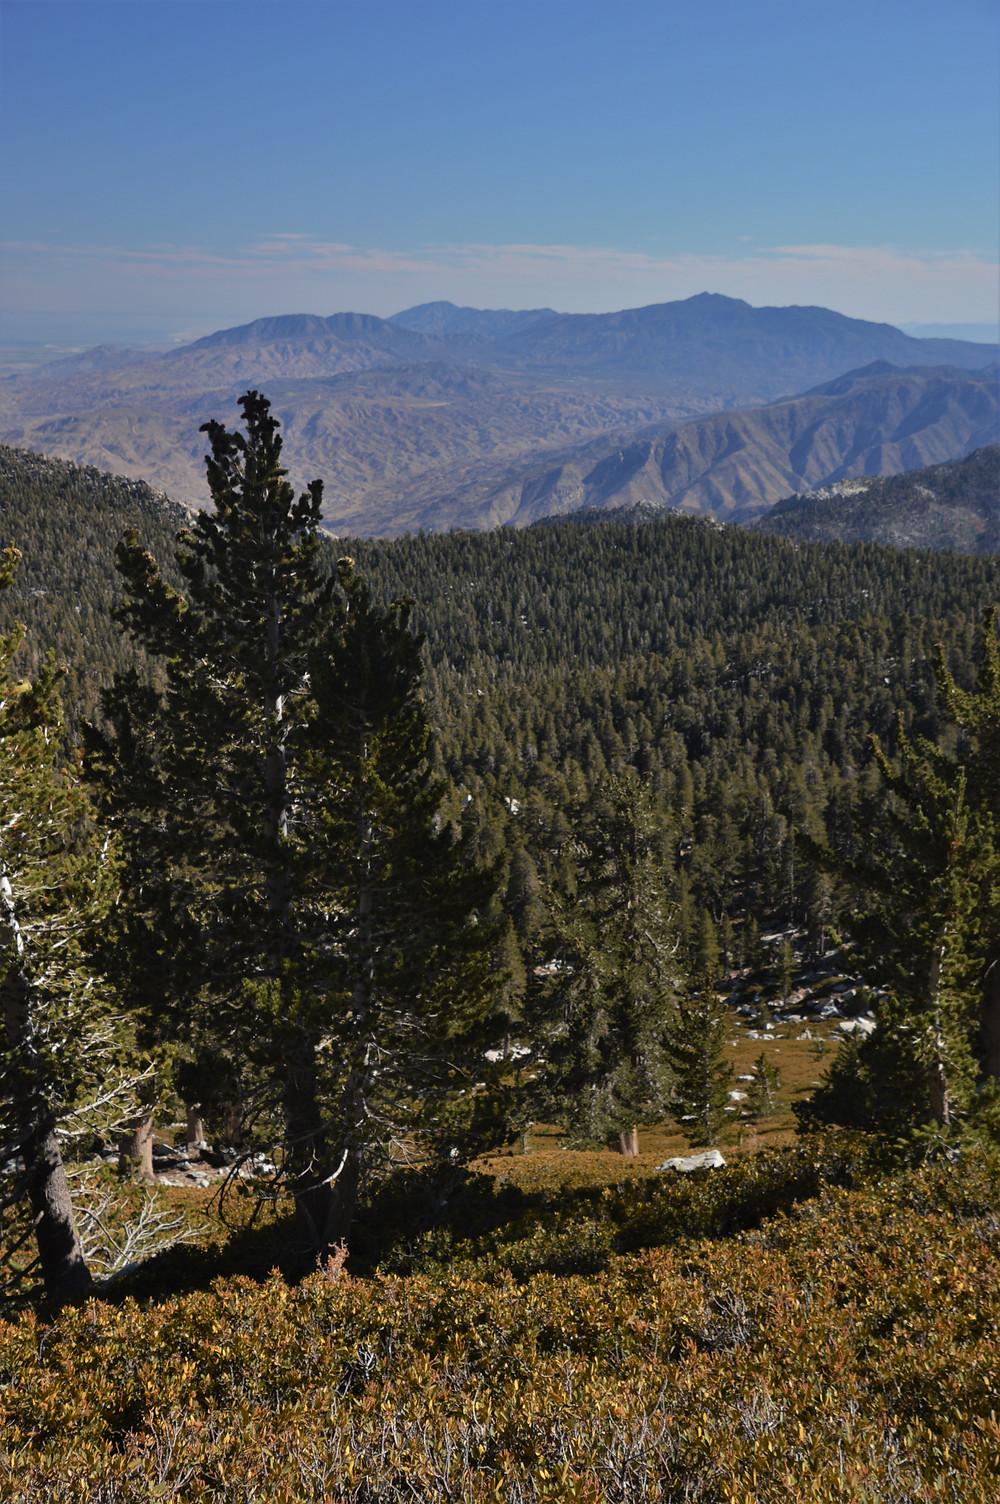 San Jacinto and Santa Rosa Mountains ranges from the San Jacinto summit trail